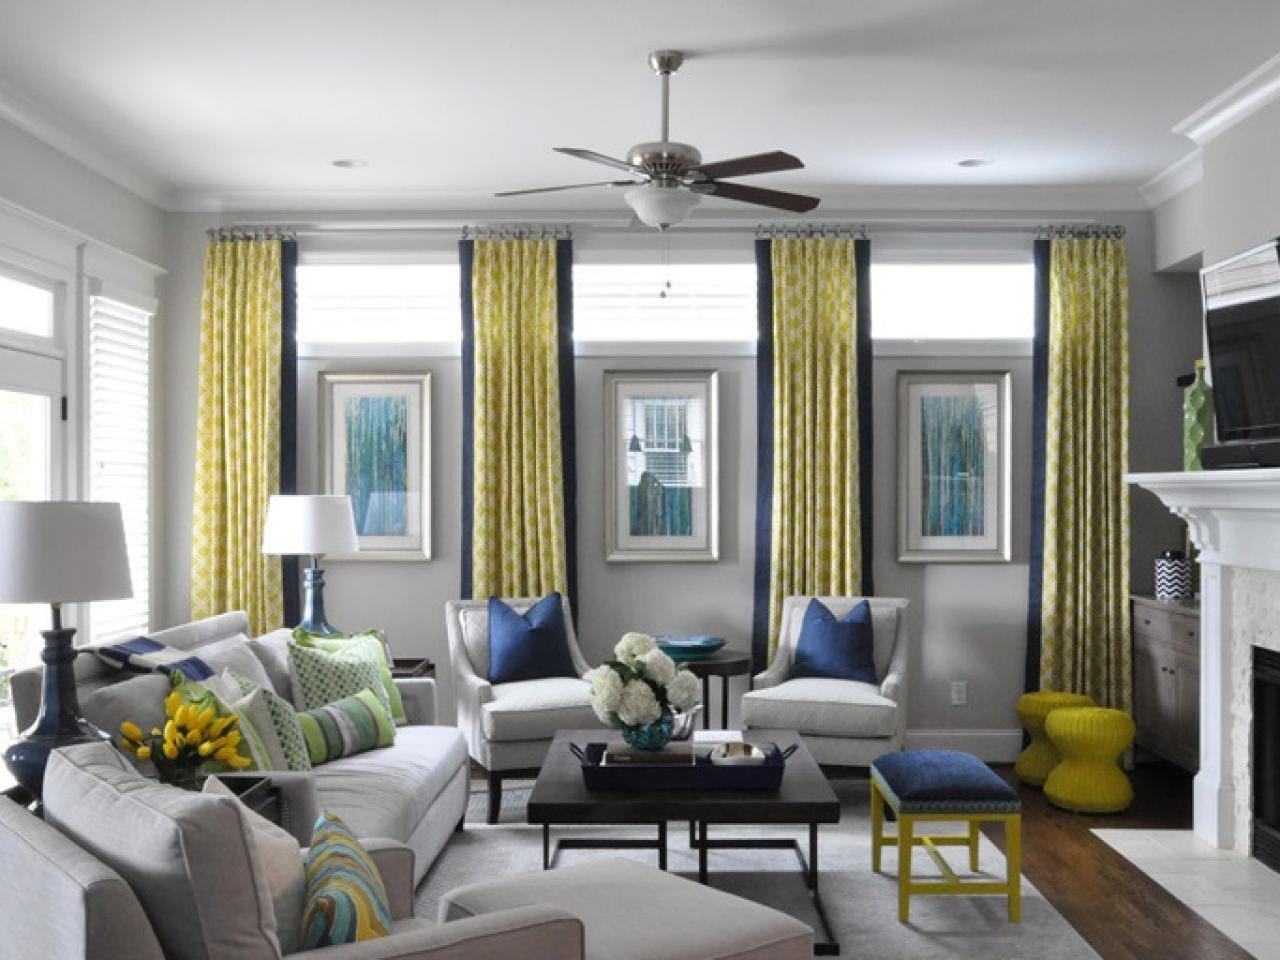 window treatments ideas awesome window treatment ideas for living room - youtube TQTWBZQ